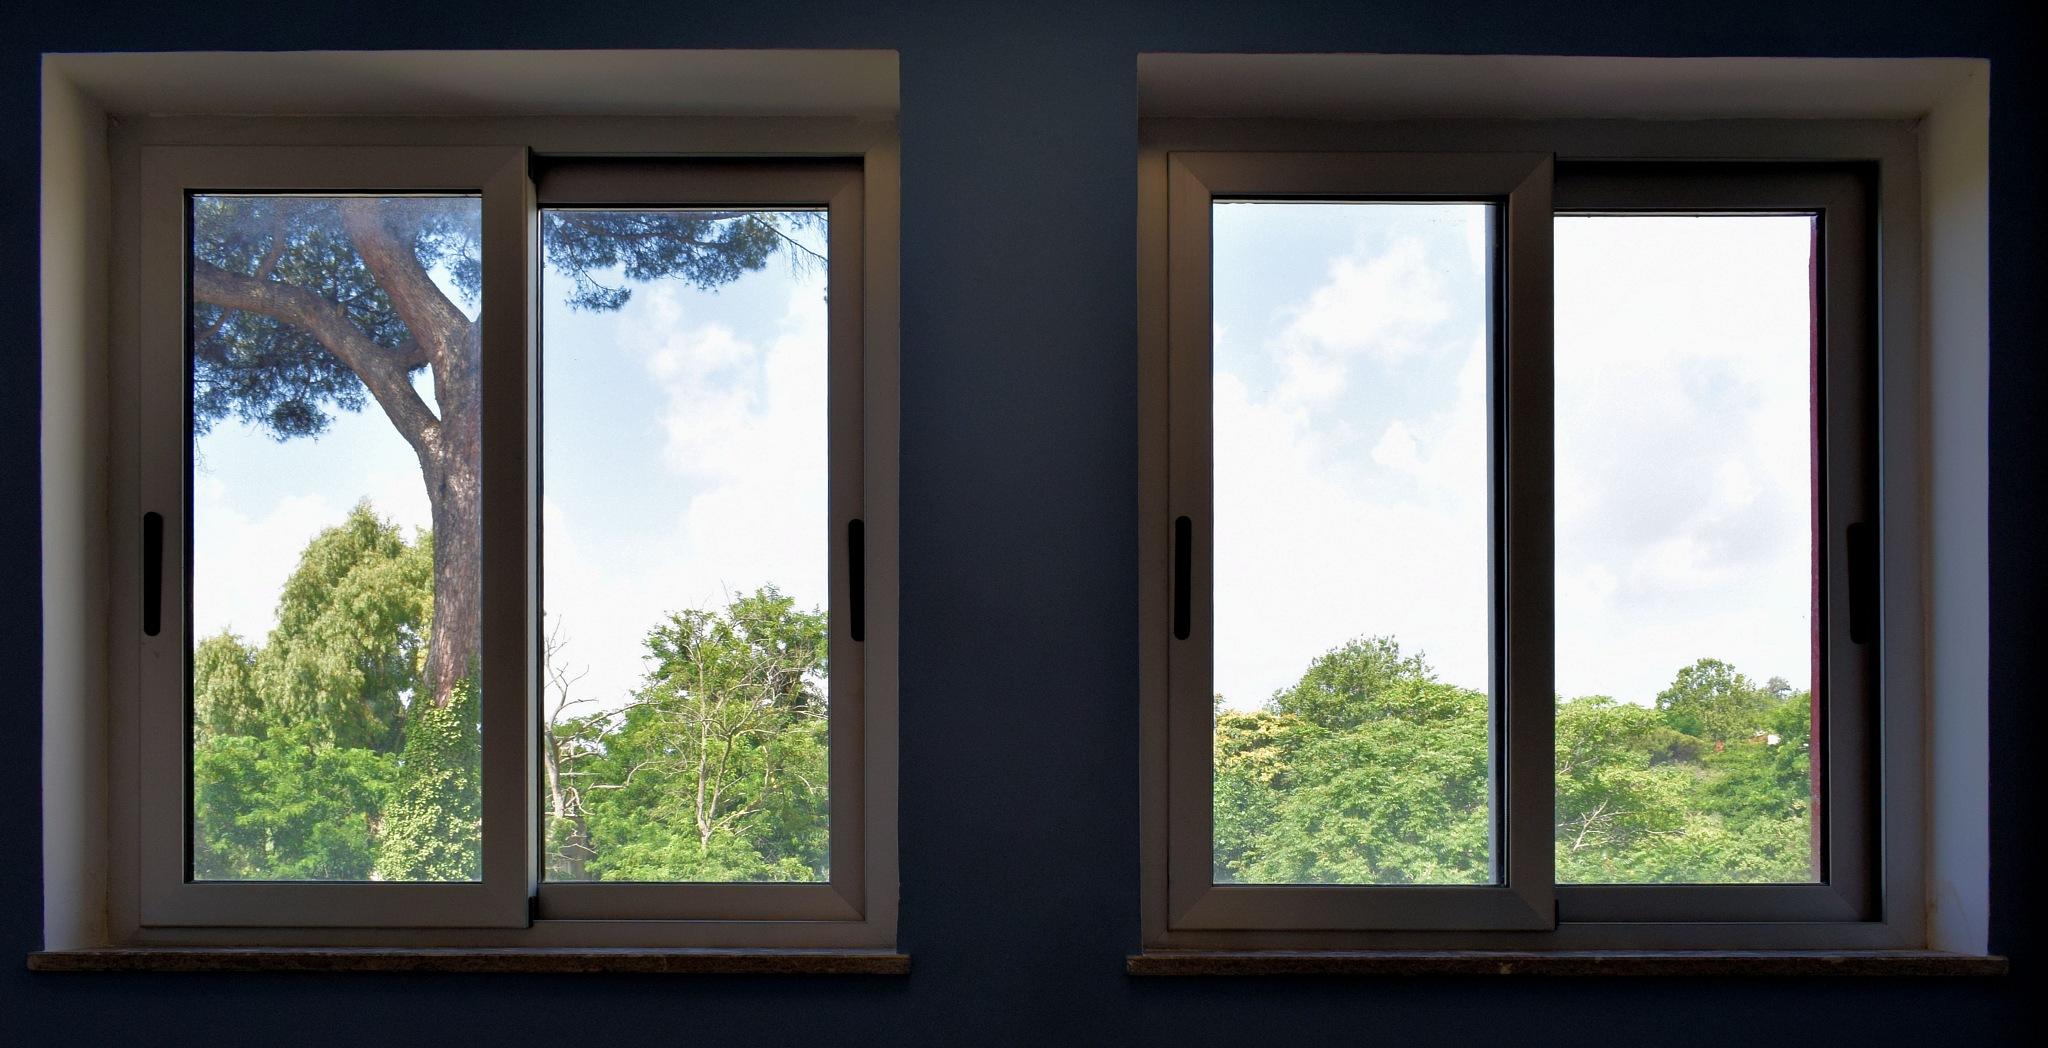 Naples - The Windows Of The Green World - 2 by Mister Arnauna & Gatto Giuggiolone